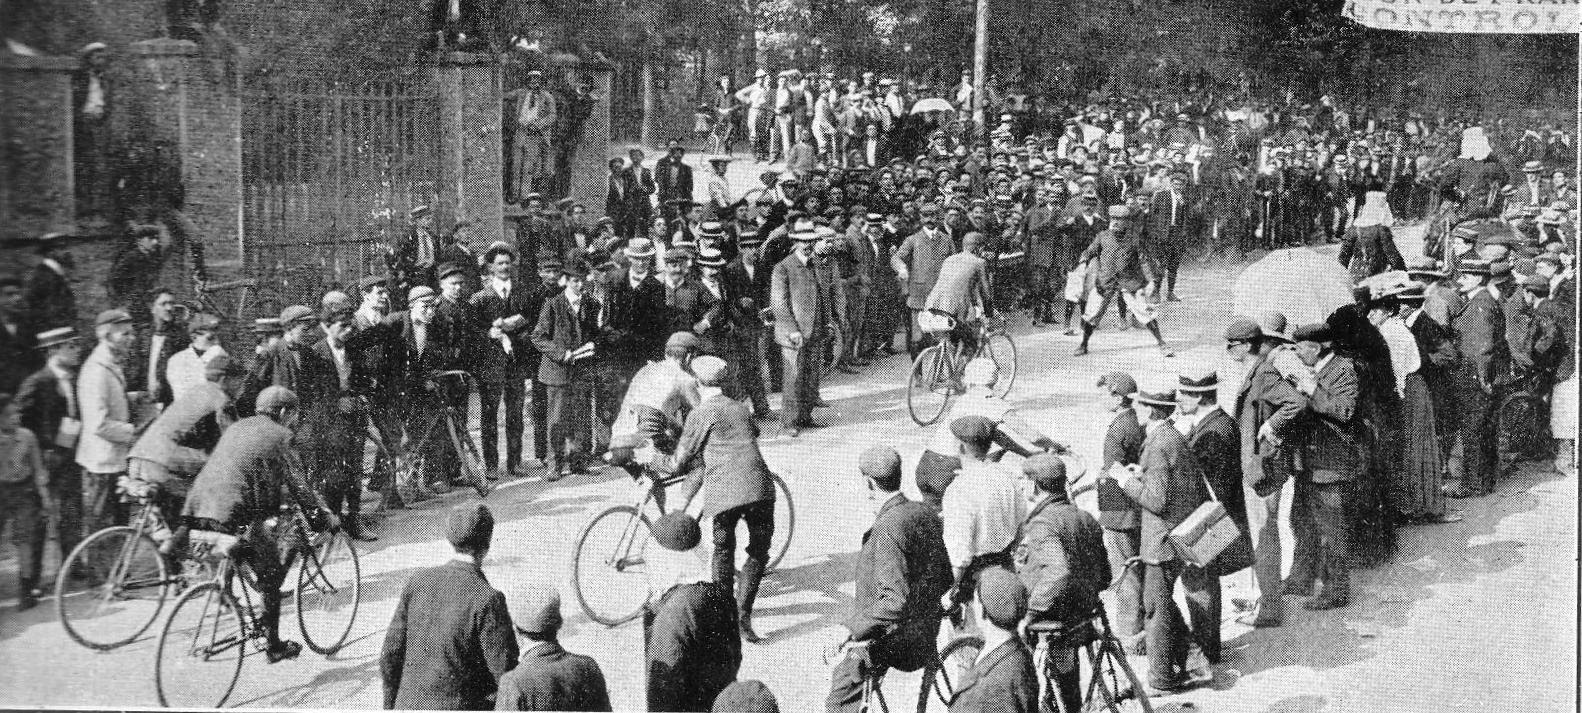 http://upload.wikimedia.org/wikipedia/de/3/3b/Tour_de_France_1907_Ville_d%27Avray.jpg